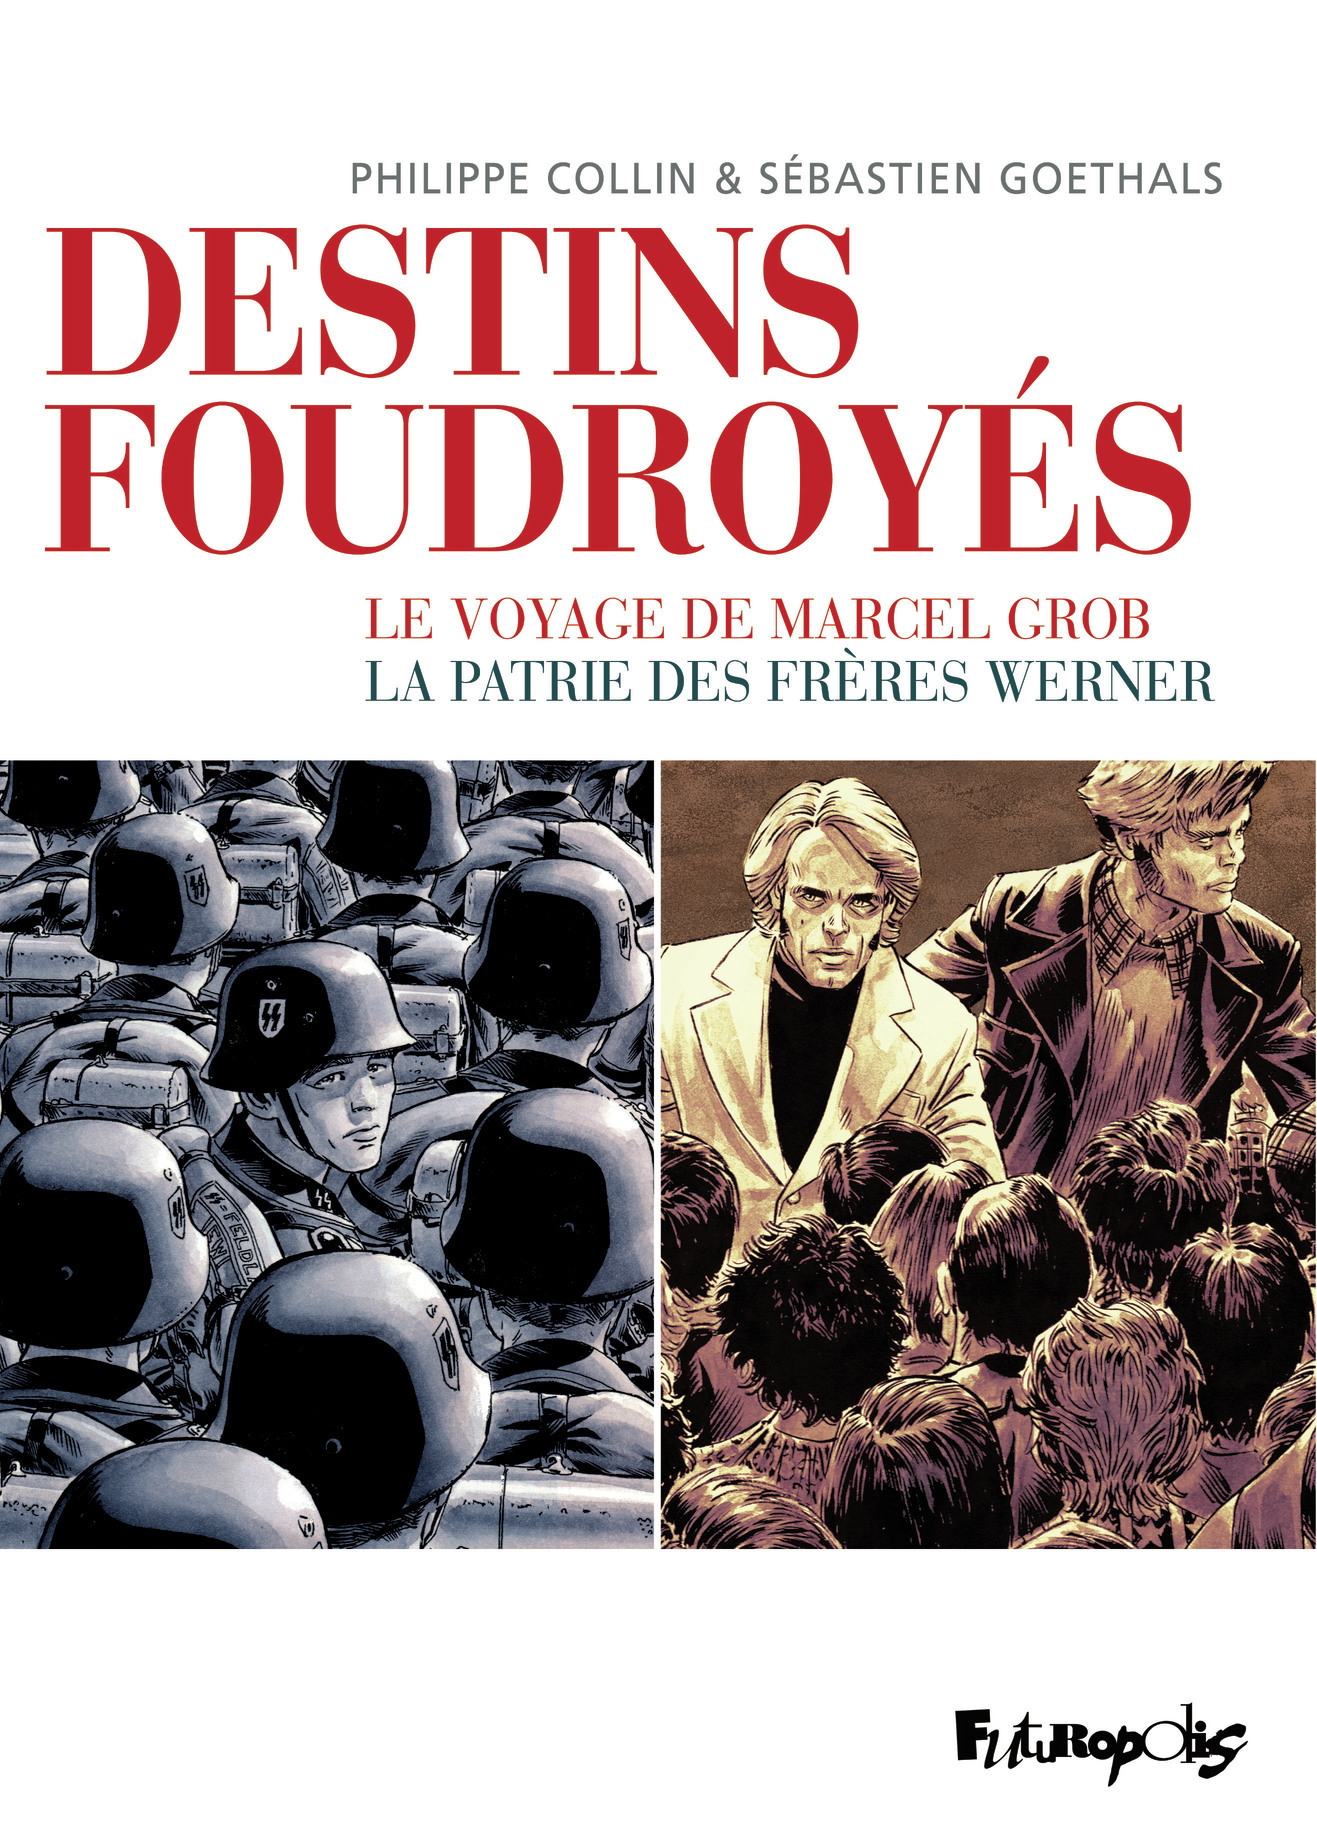 DESTINS FOUDROYES - LE VOYAGE DE MARCEL GROB, LA PATRIE DES FRERES WERNER